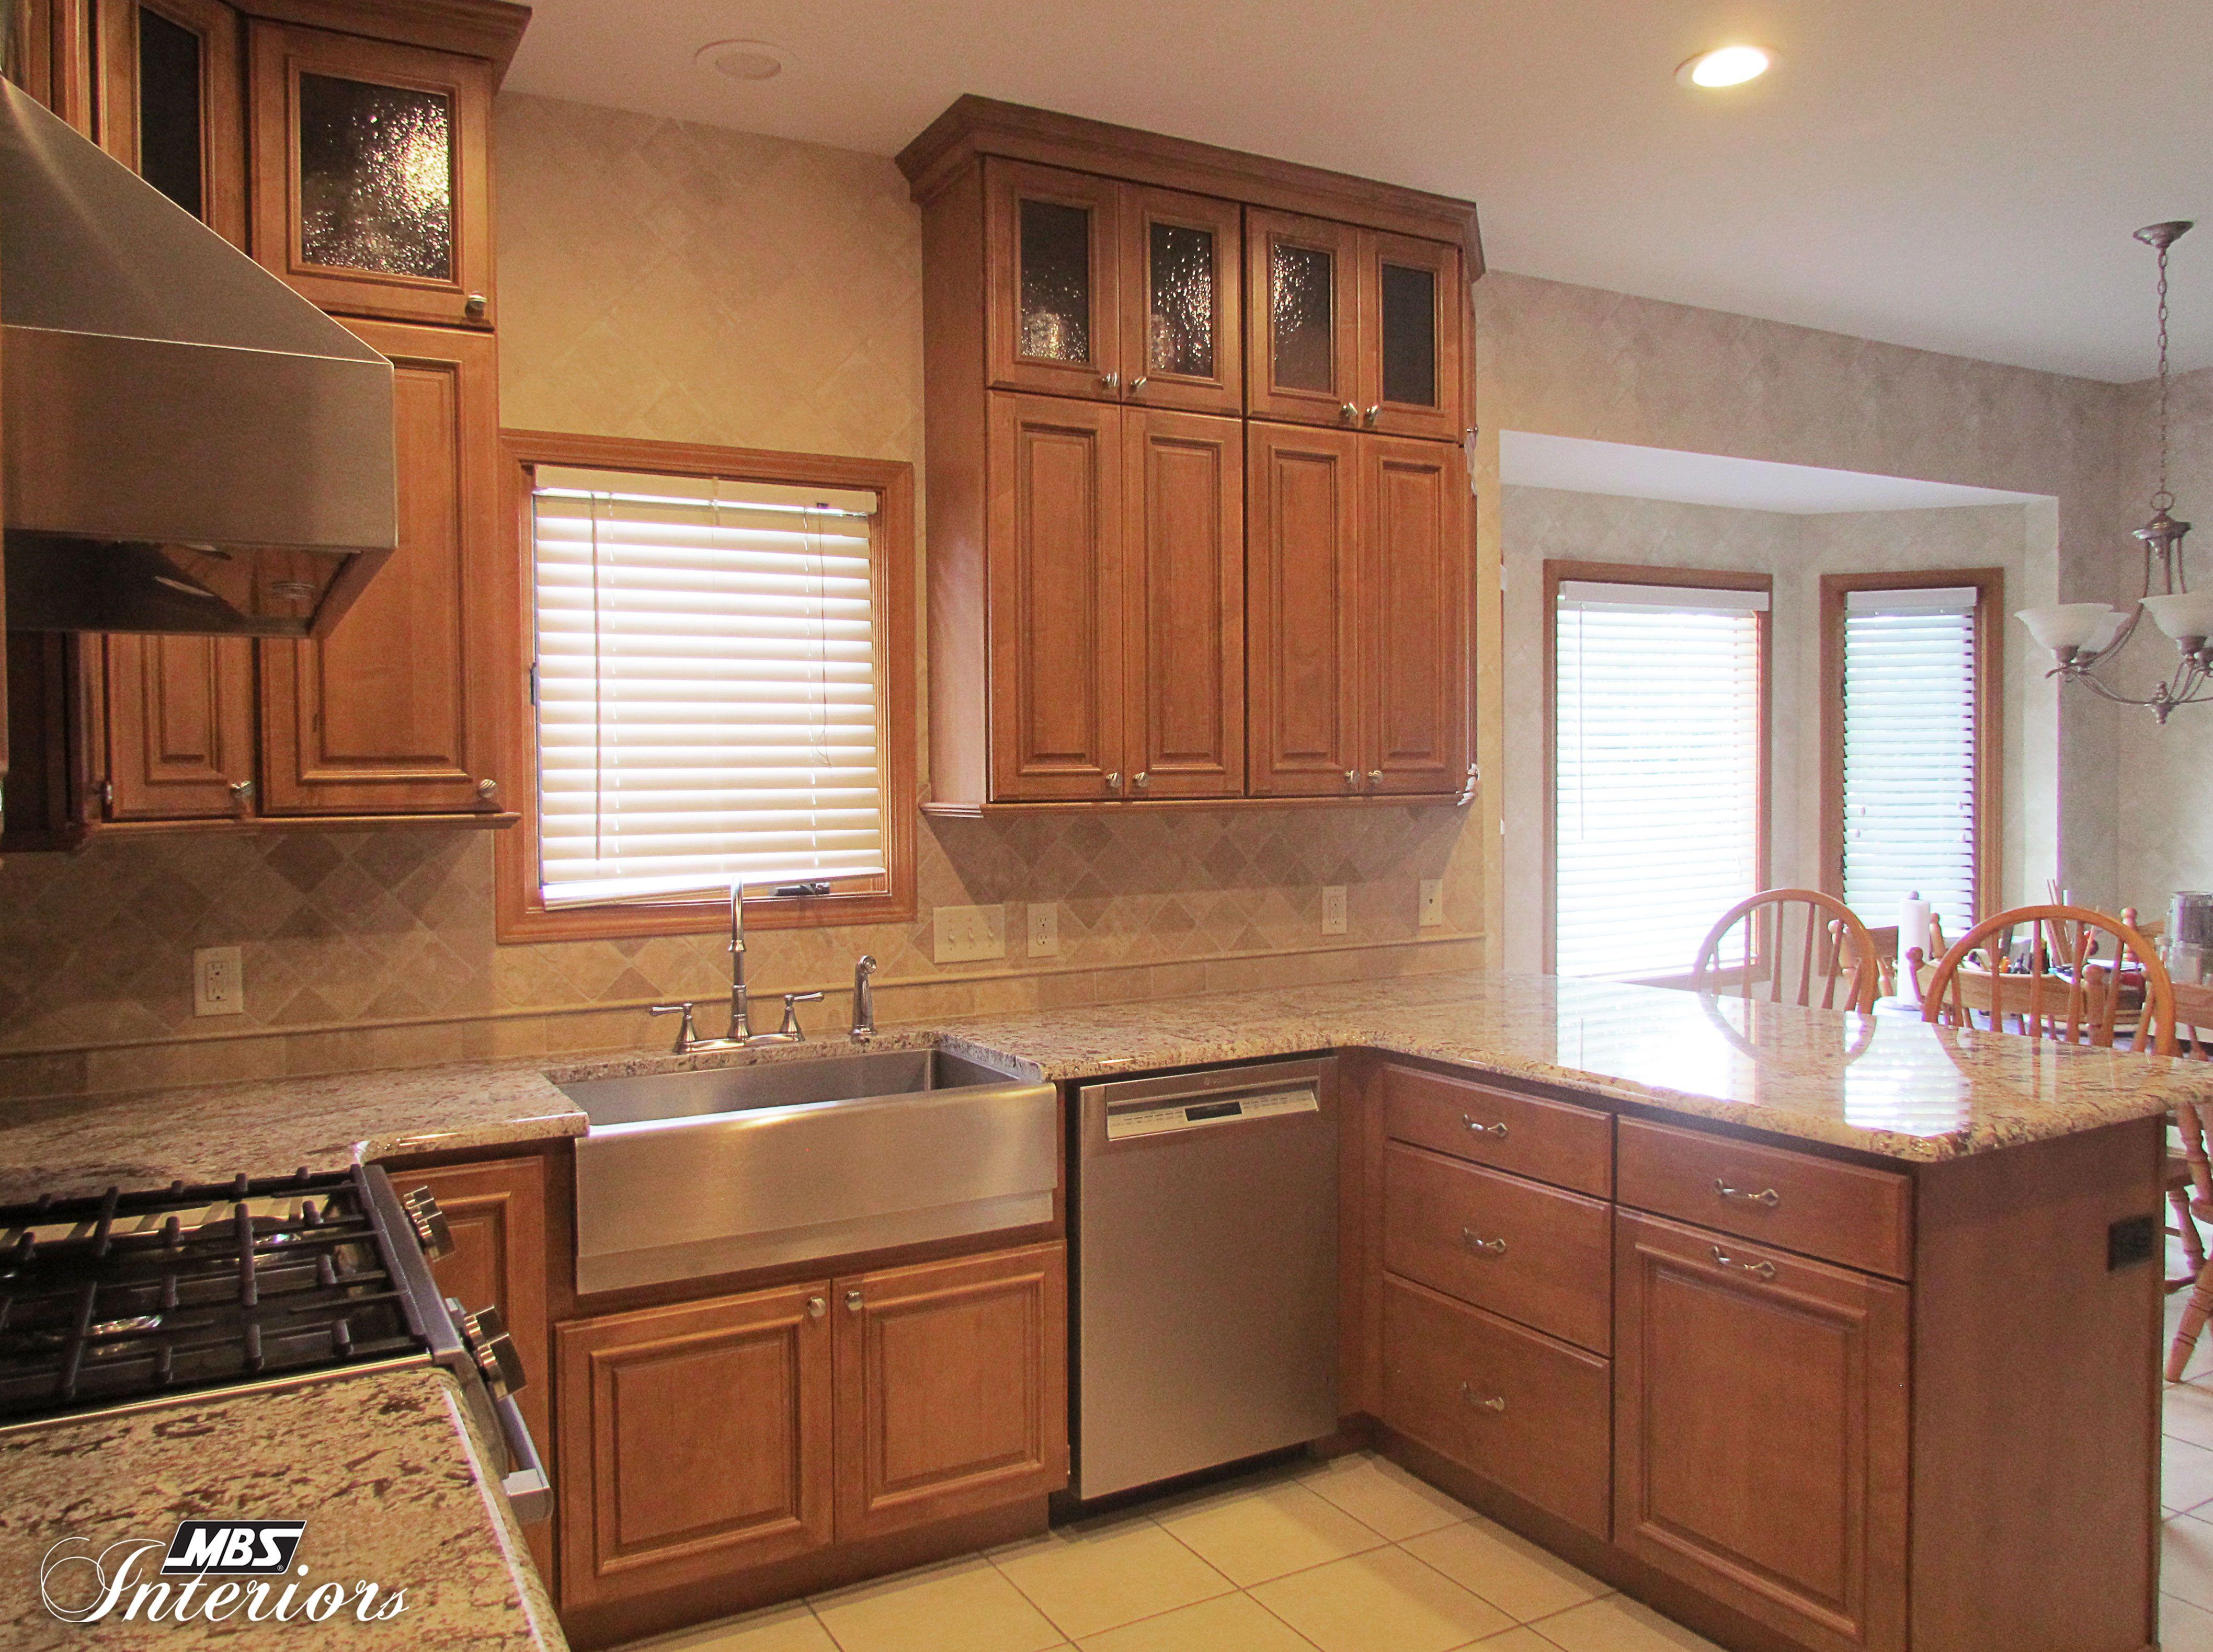 Kitchen Cabinets StarMark Cabinetry Hanover door in mushroom